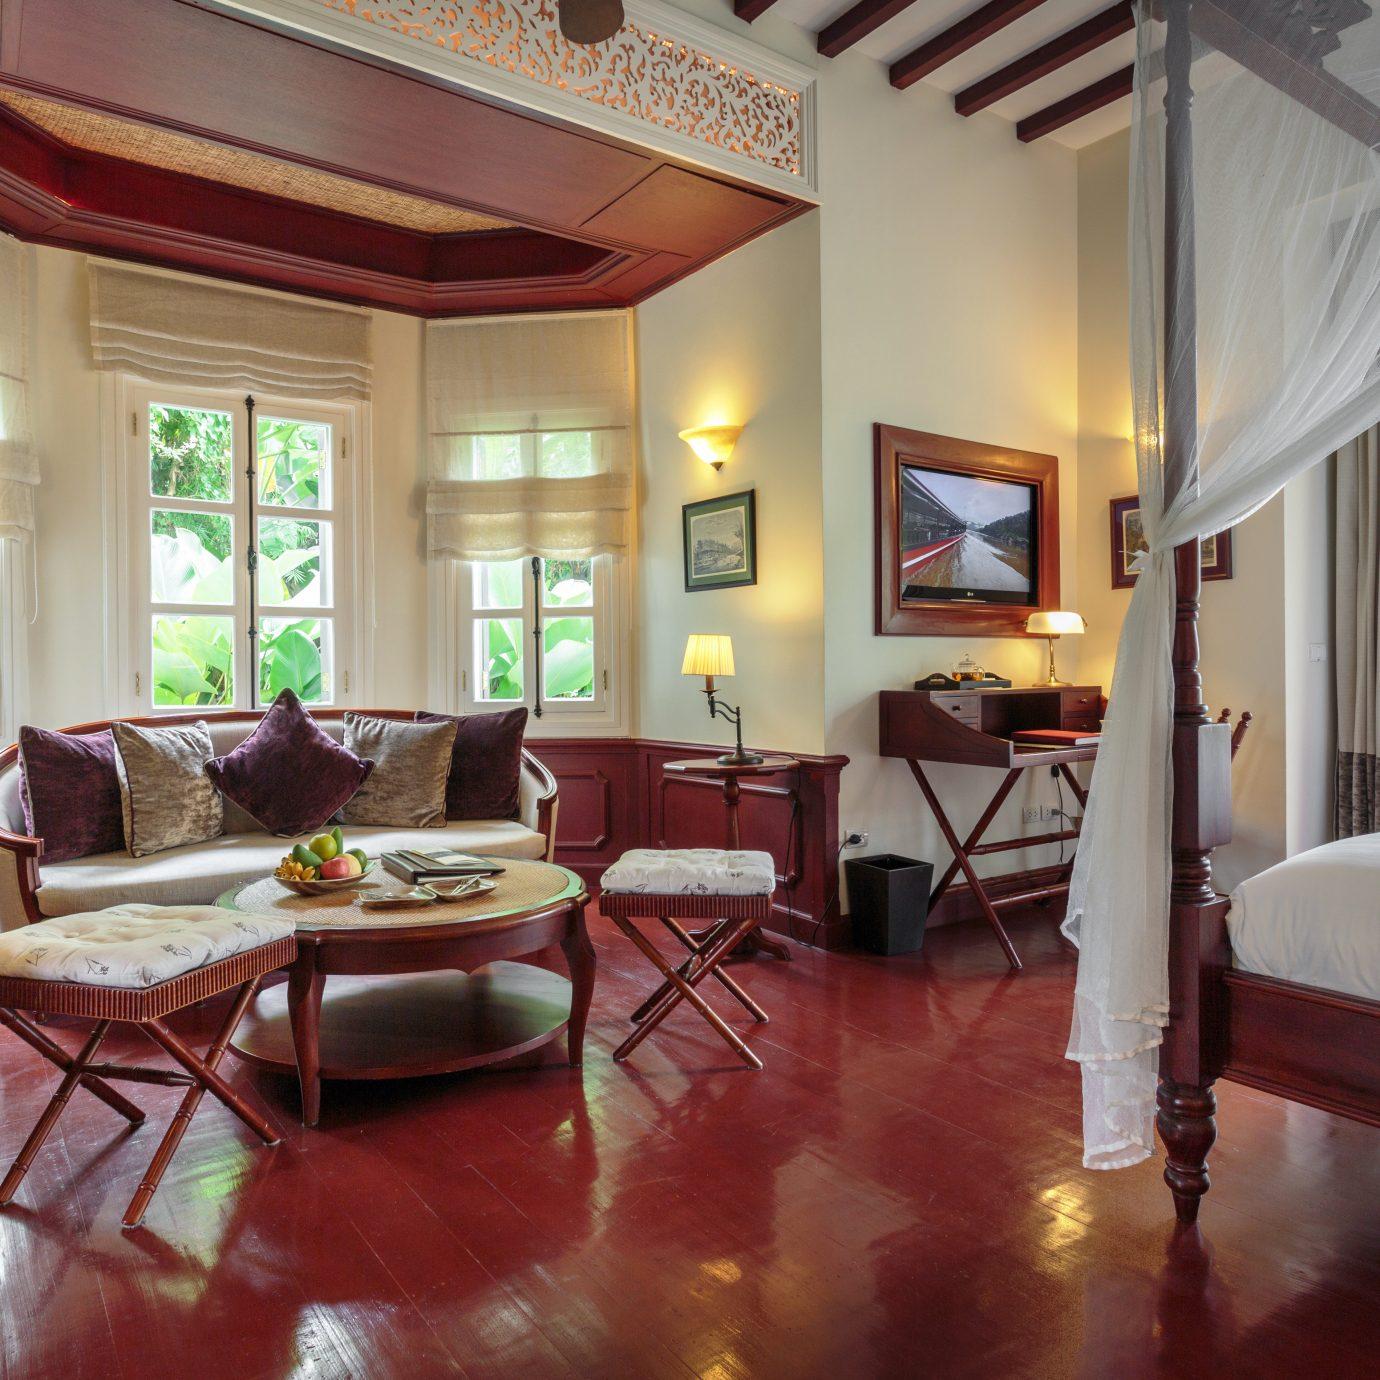 Bedroom Elegant Historic Luxury Suite property living room house home condominium Villa mansion Resort